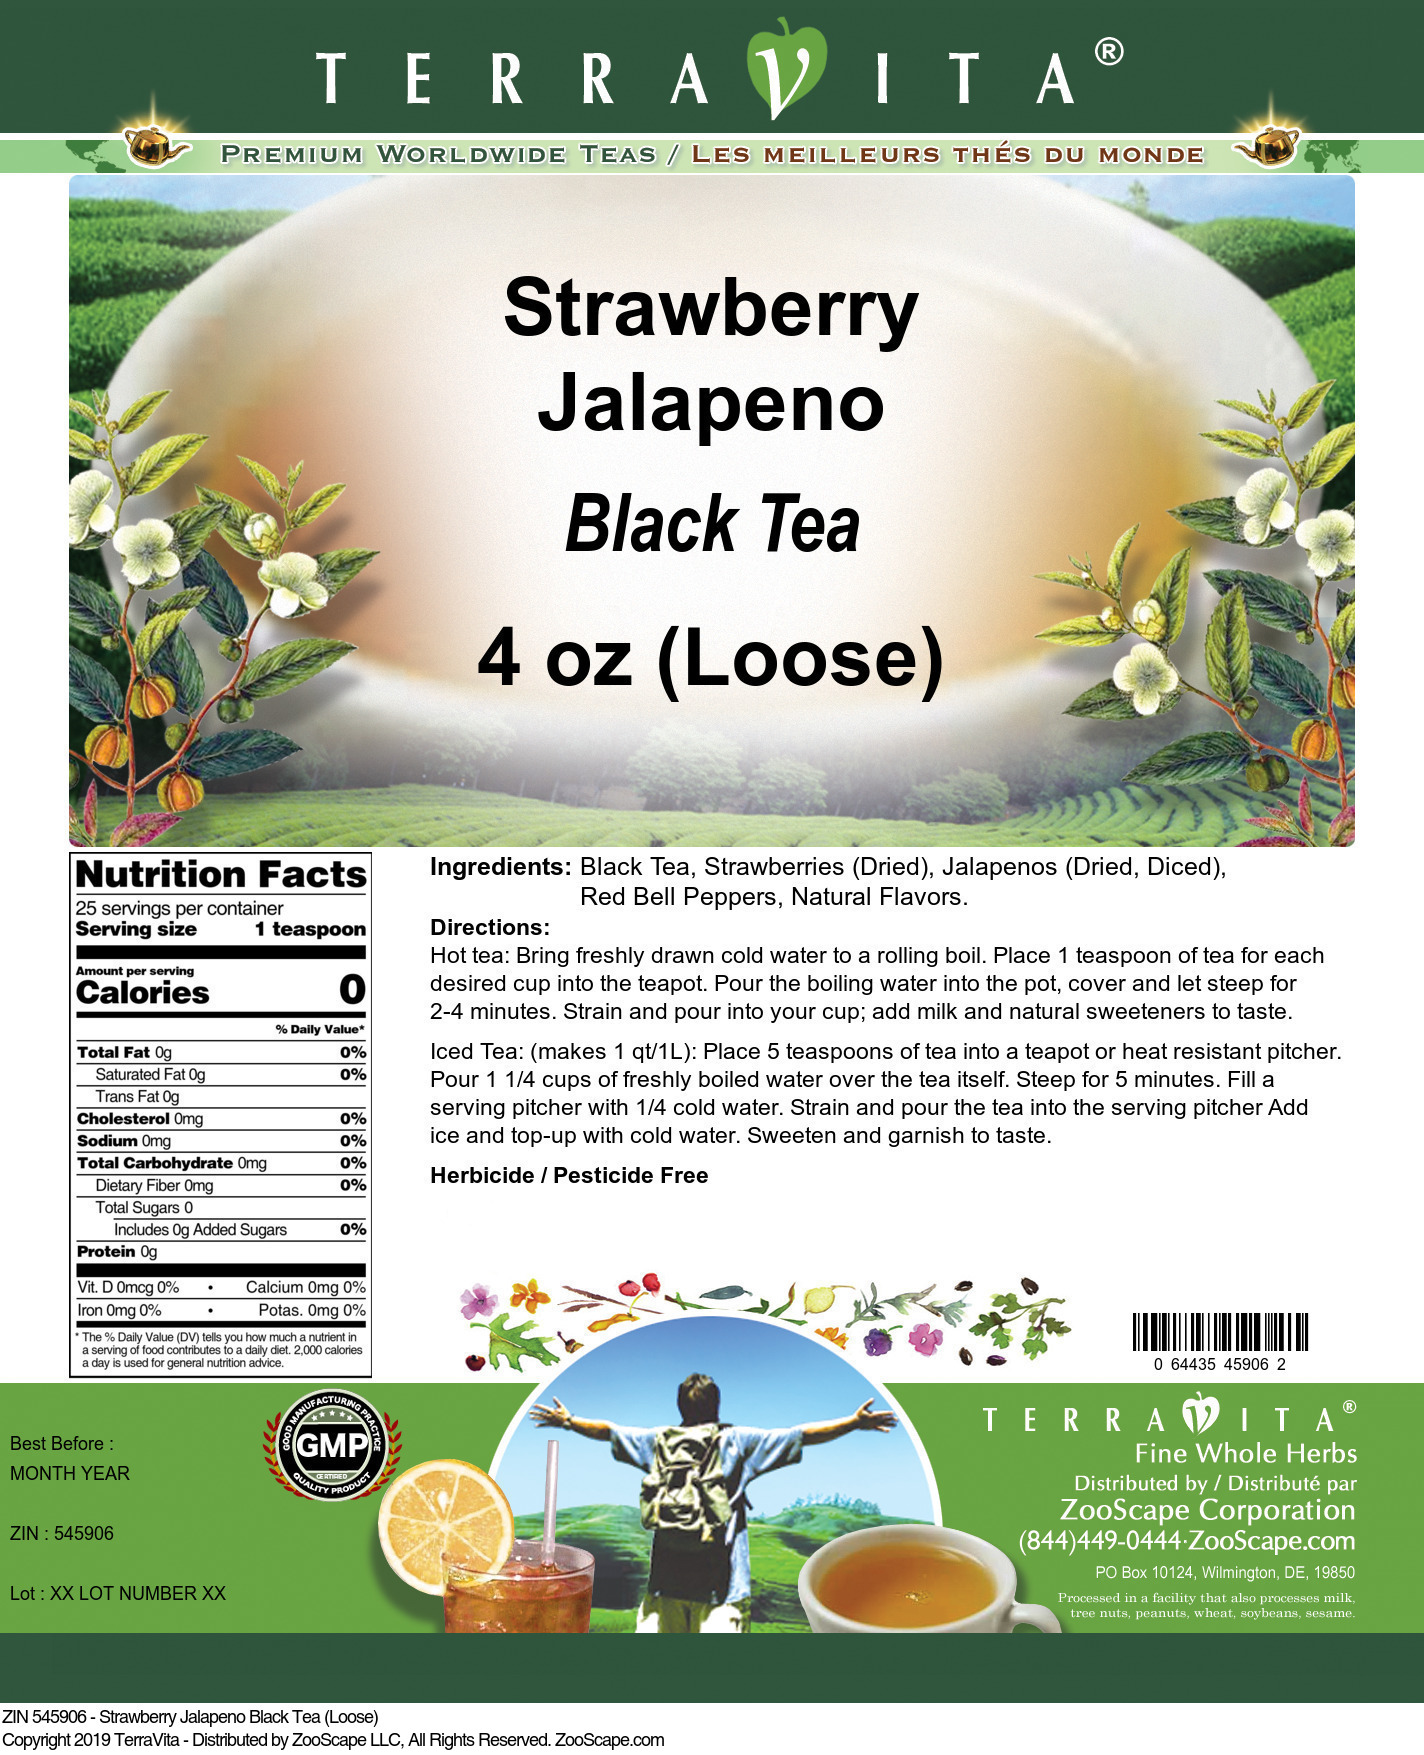 Strawberry Jalapeno Black Tea